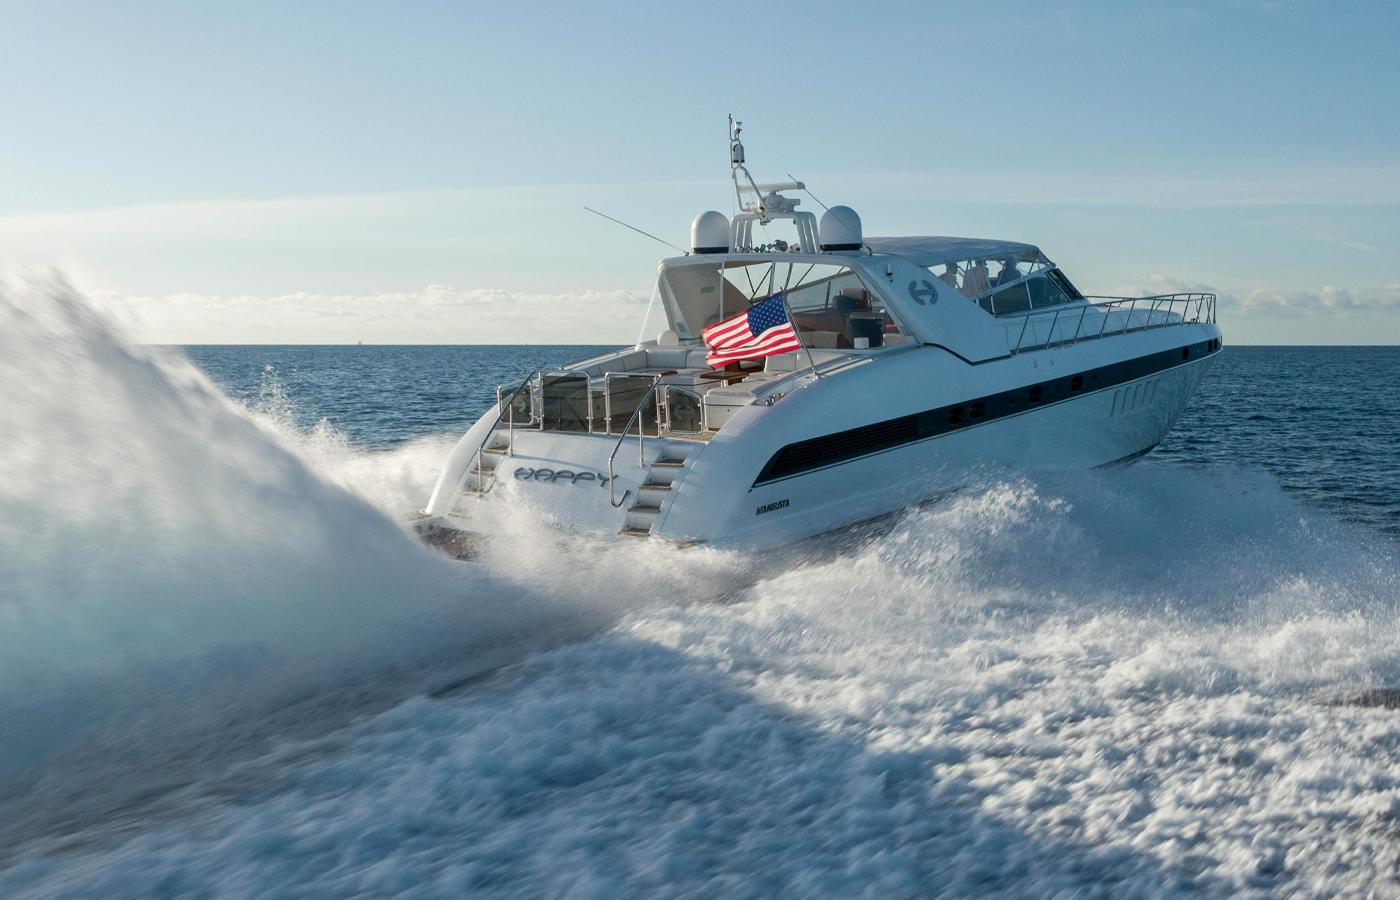 Mangusta 80 Motor Yacht Highlight [Boat Review + Video]